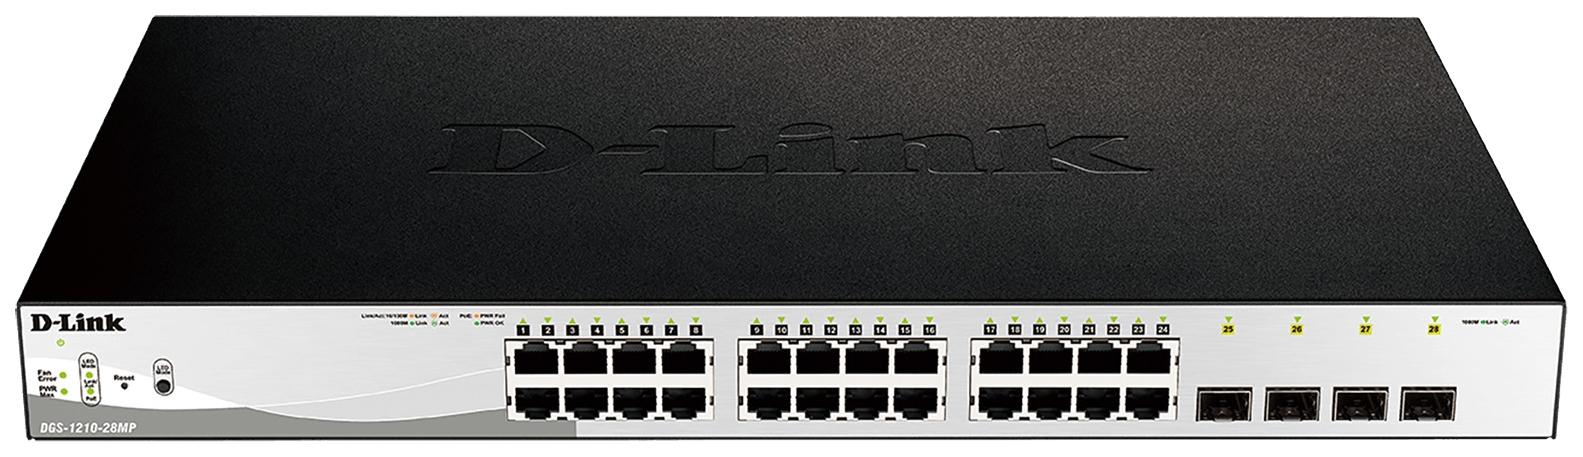 Коммутатор D-Link Web Smart DGS-1210-28MP/E1A Grey/Black